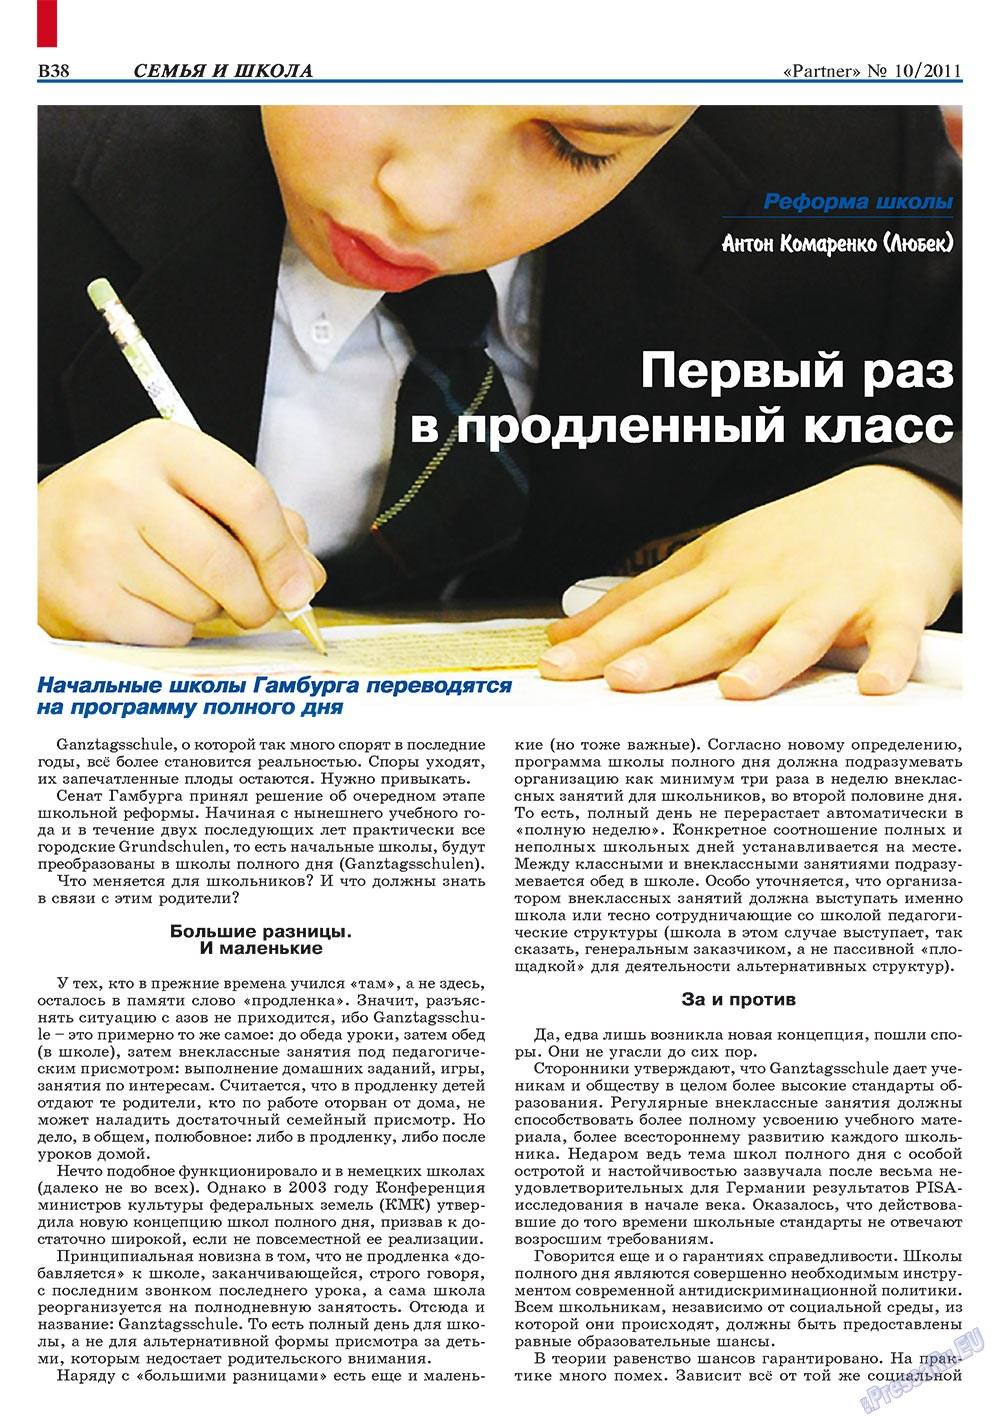 Партнер-север (журнал). 2011 год, номер 10, стр. 48